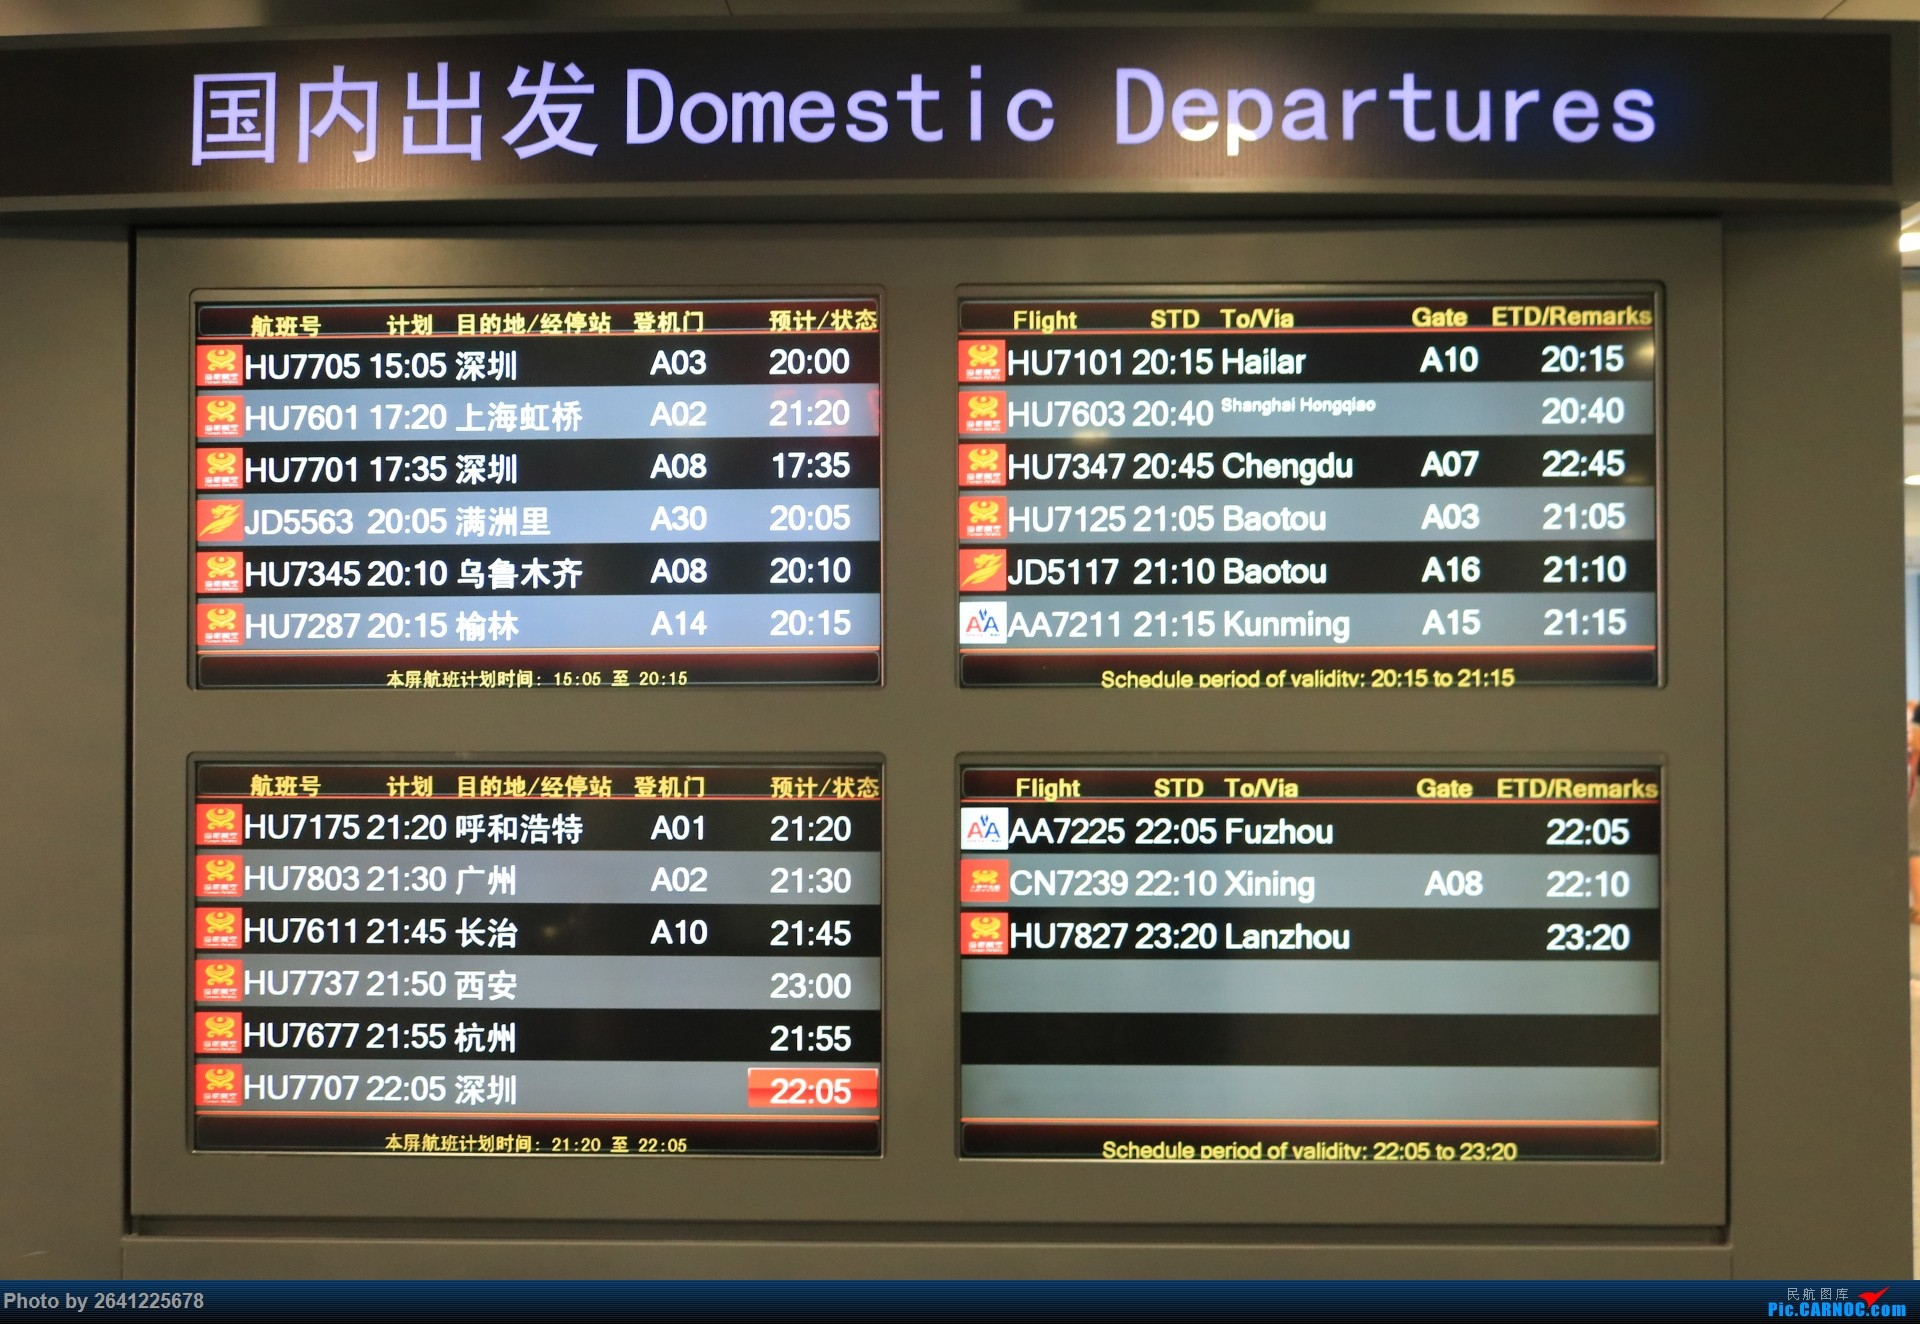 Re:[原创]【小周游记第3集】草原茫茫天地间,洁白的蒙古包散落在河边——内蒙古5天4飞半自由行(宽体与支线客机初体验)有flight log和驾驶舱哦